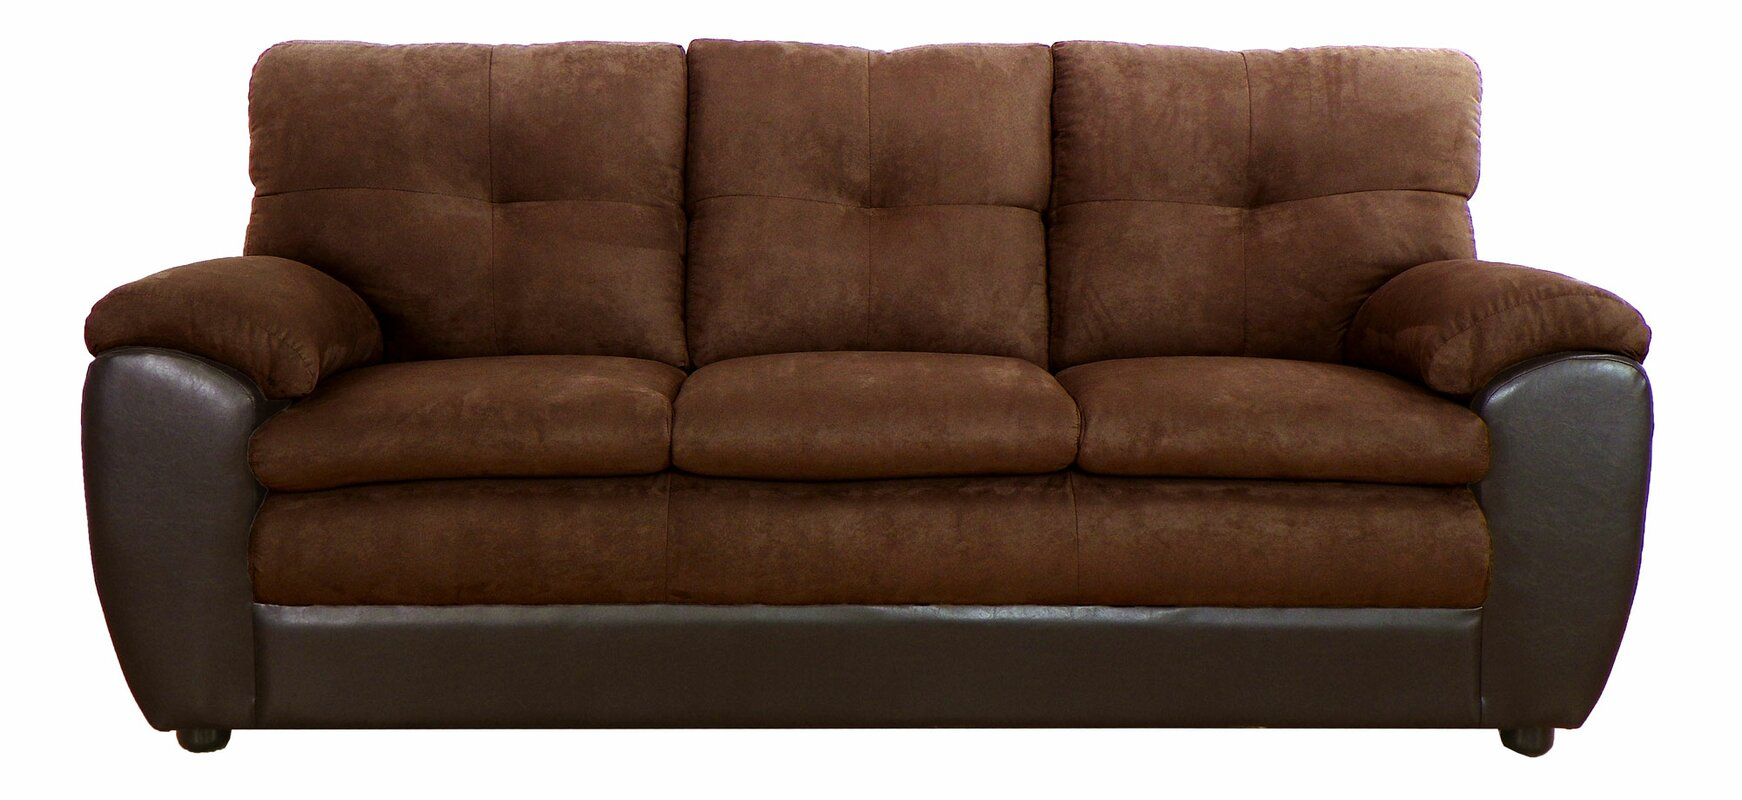 brewster sofa bett sofas loveseats sleepers furniture. Black Bedroom Furniture Sets. Home Design Ideas